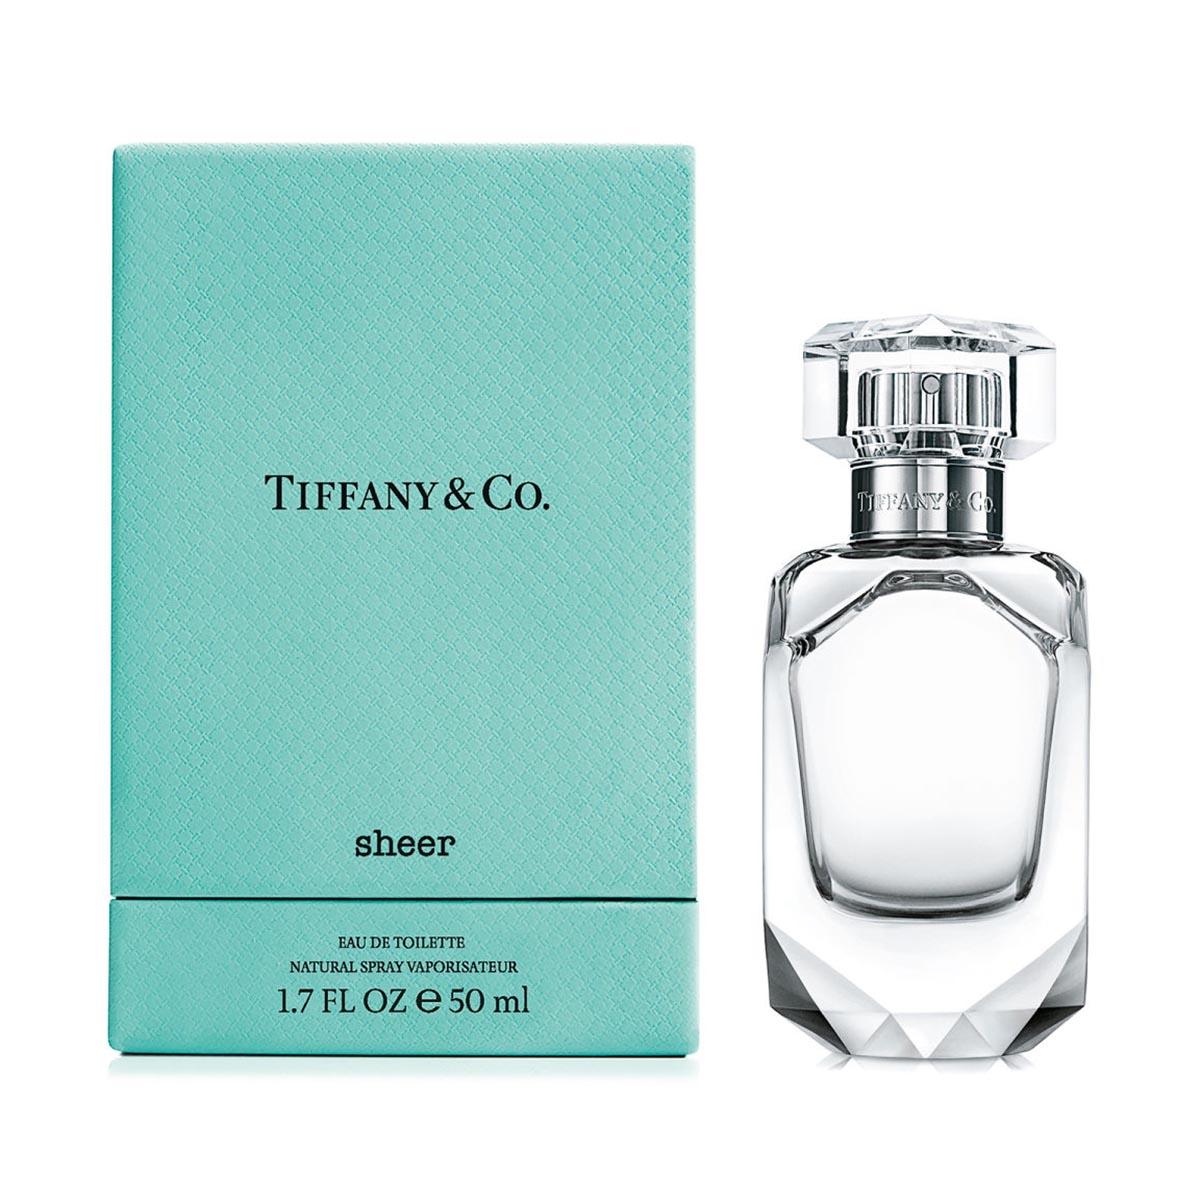 Tiffany s sheer eau de toilette 50ml vaporizador